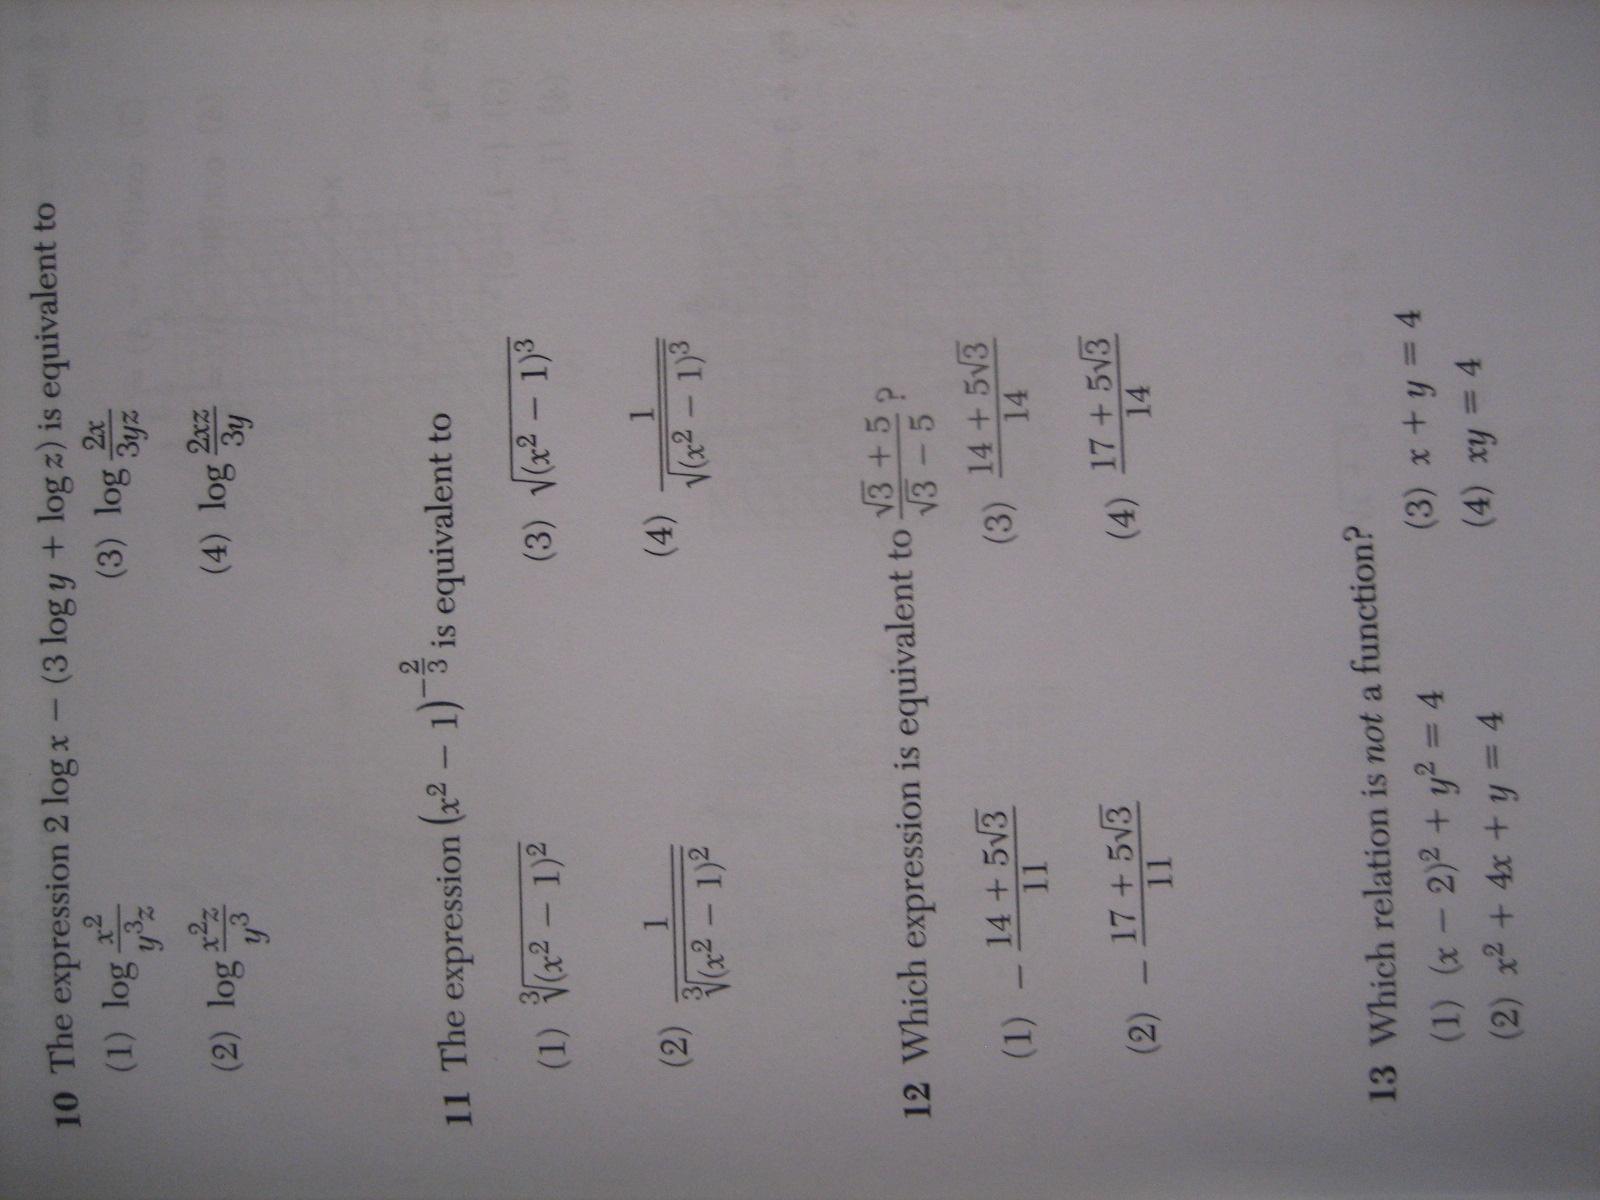 Algebra 2 / Trigonometry Regents – full list of multiple choice